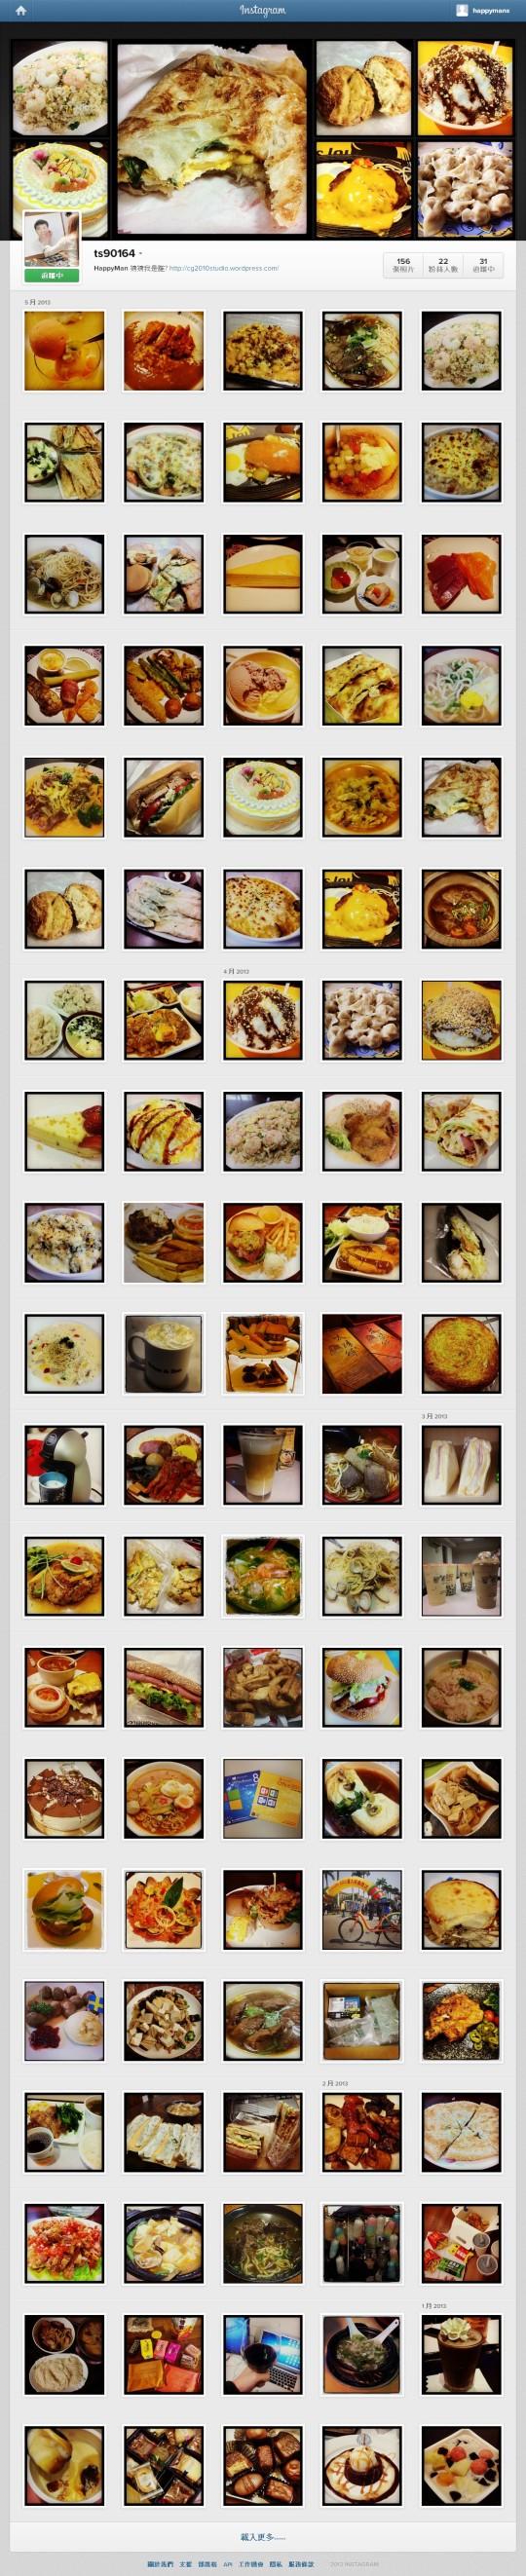 Instagram Photo Wall